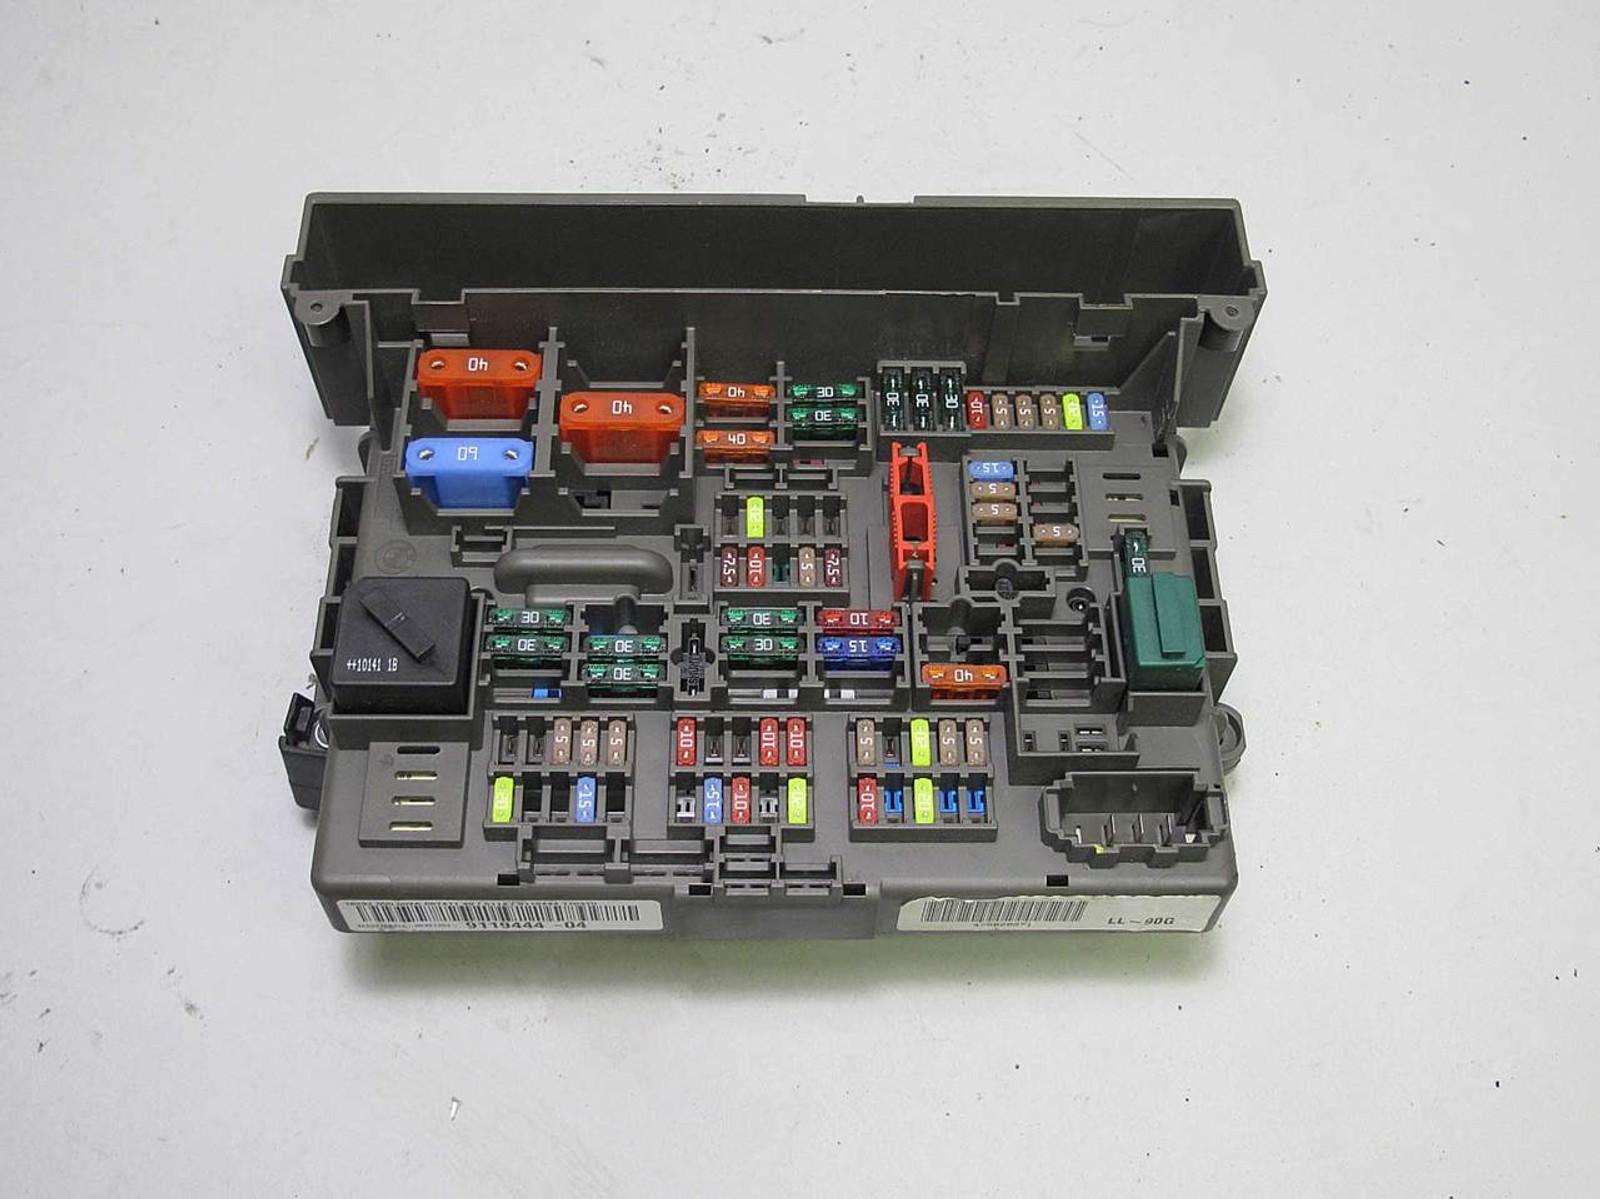 hight resolution of 2000 bmw 740il fuse box location